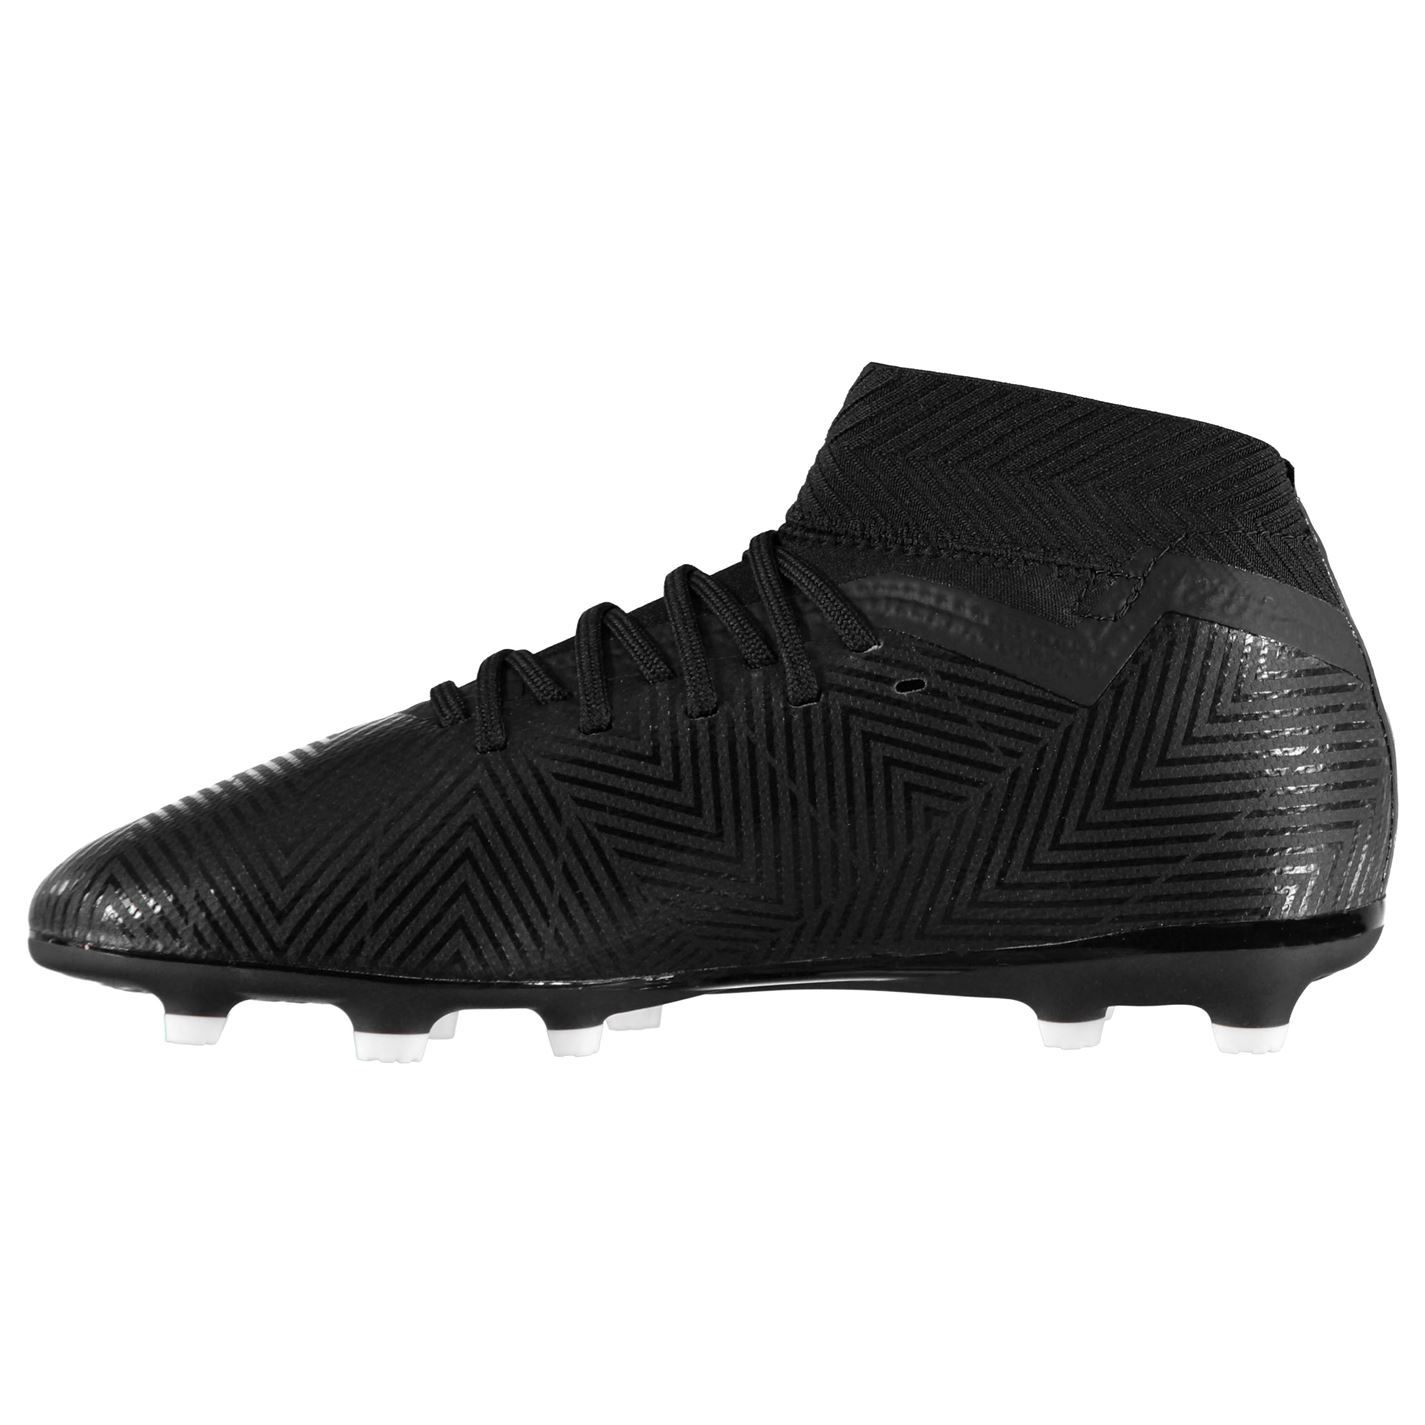 Kids Nike hypervenom football boots UK1